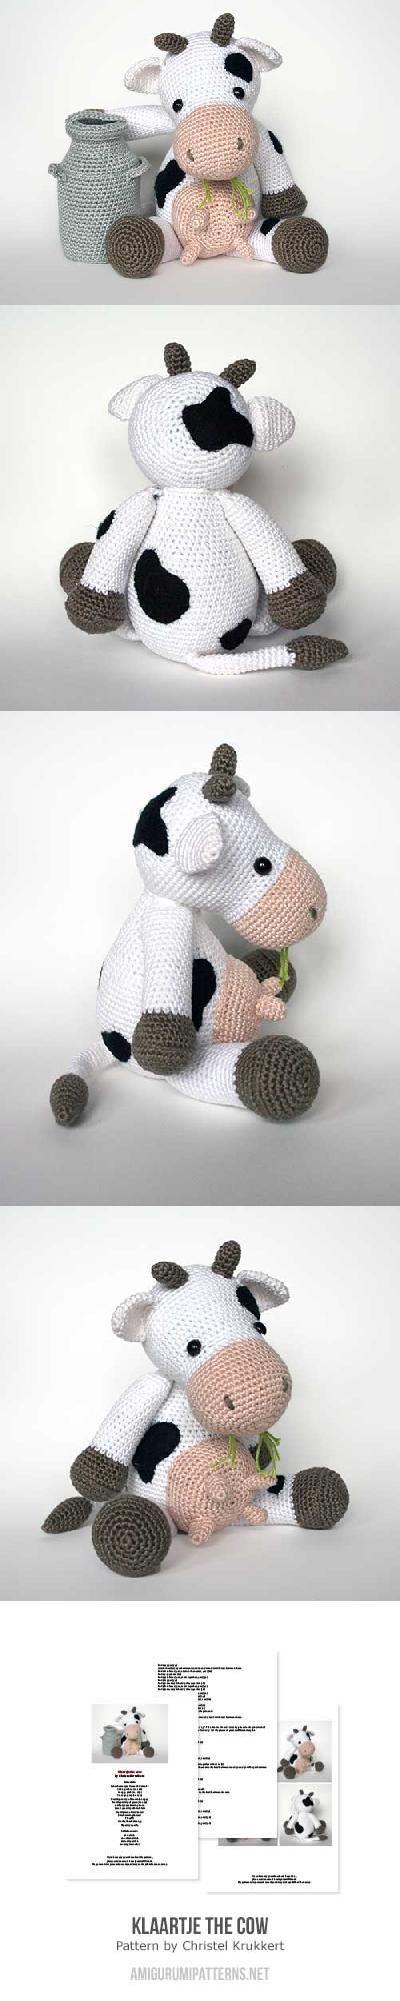 Klaartje The Cow Amigurumi Pattern